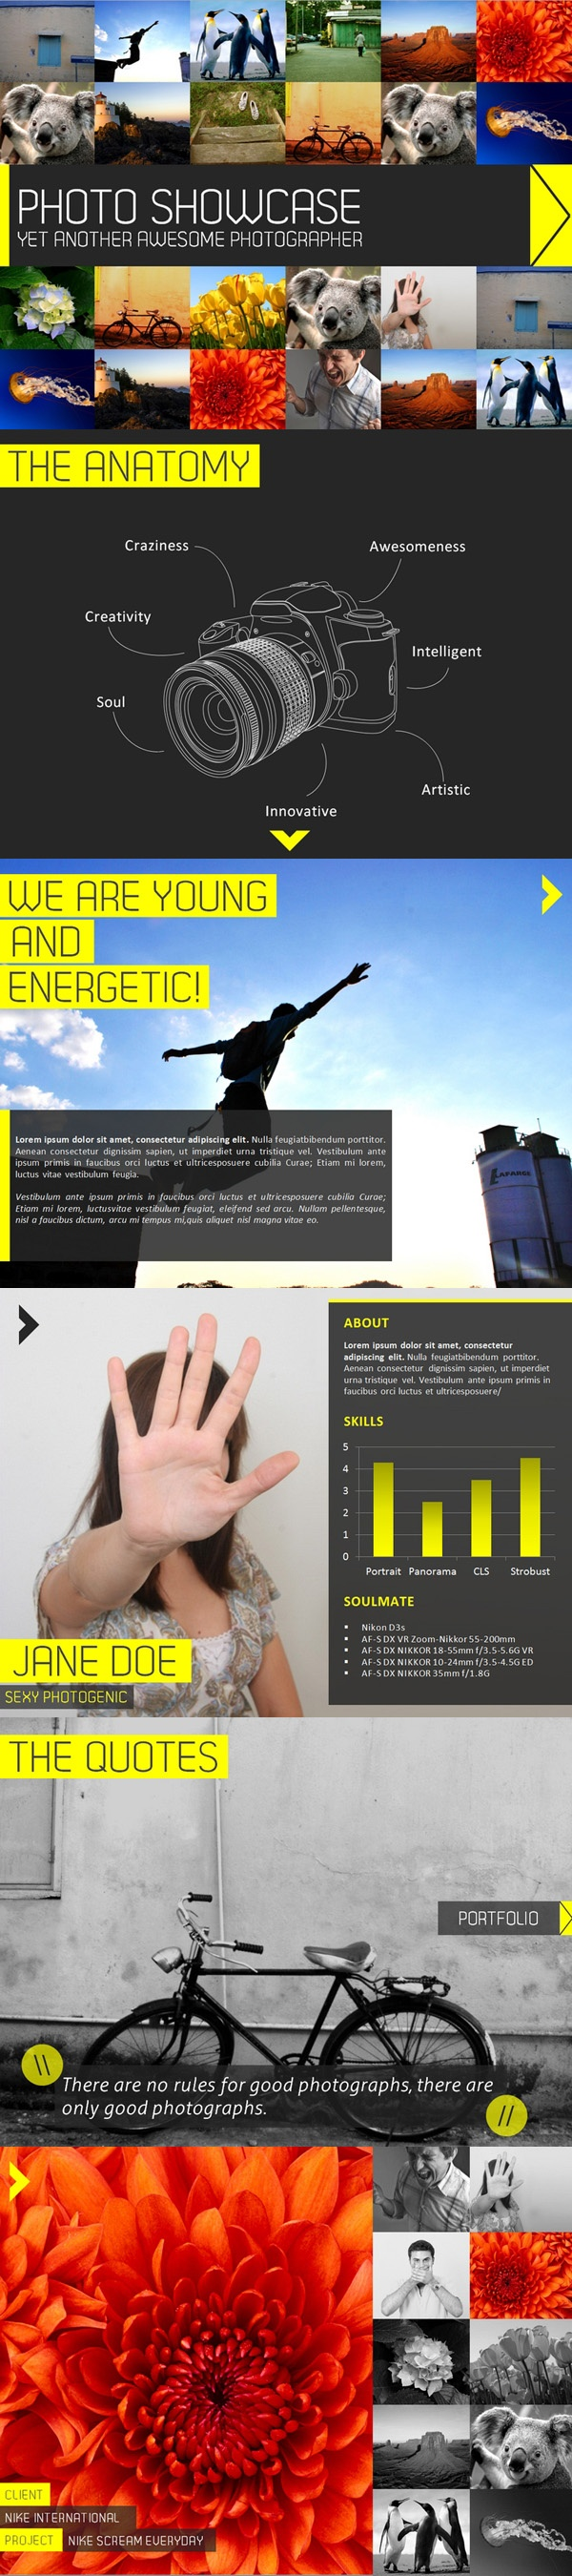 Photography Showcase PowerPoint Presentation